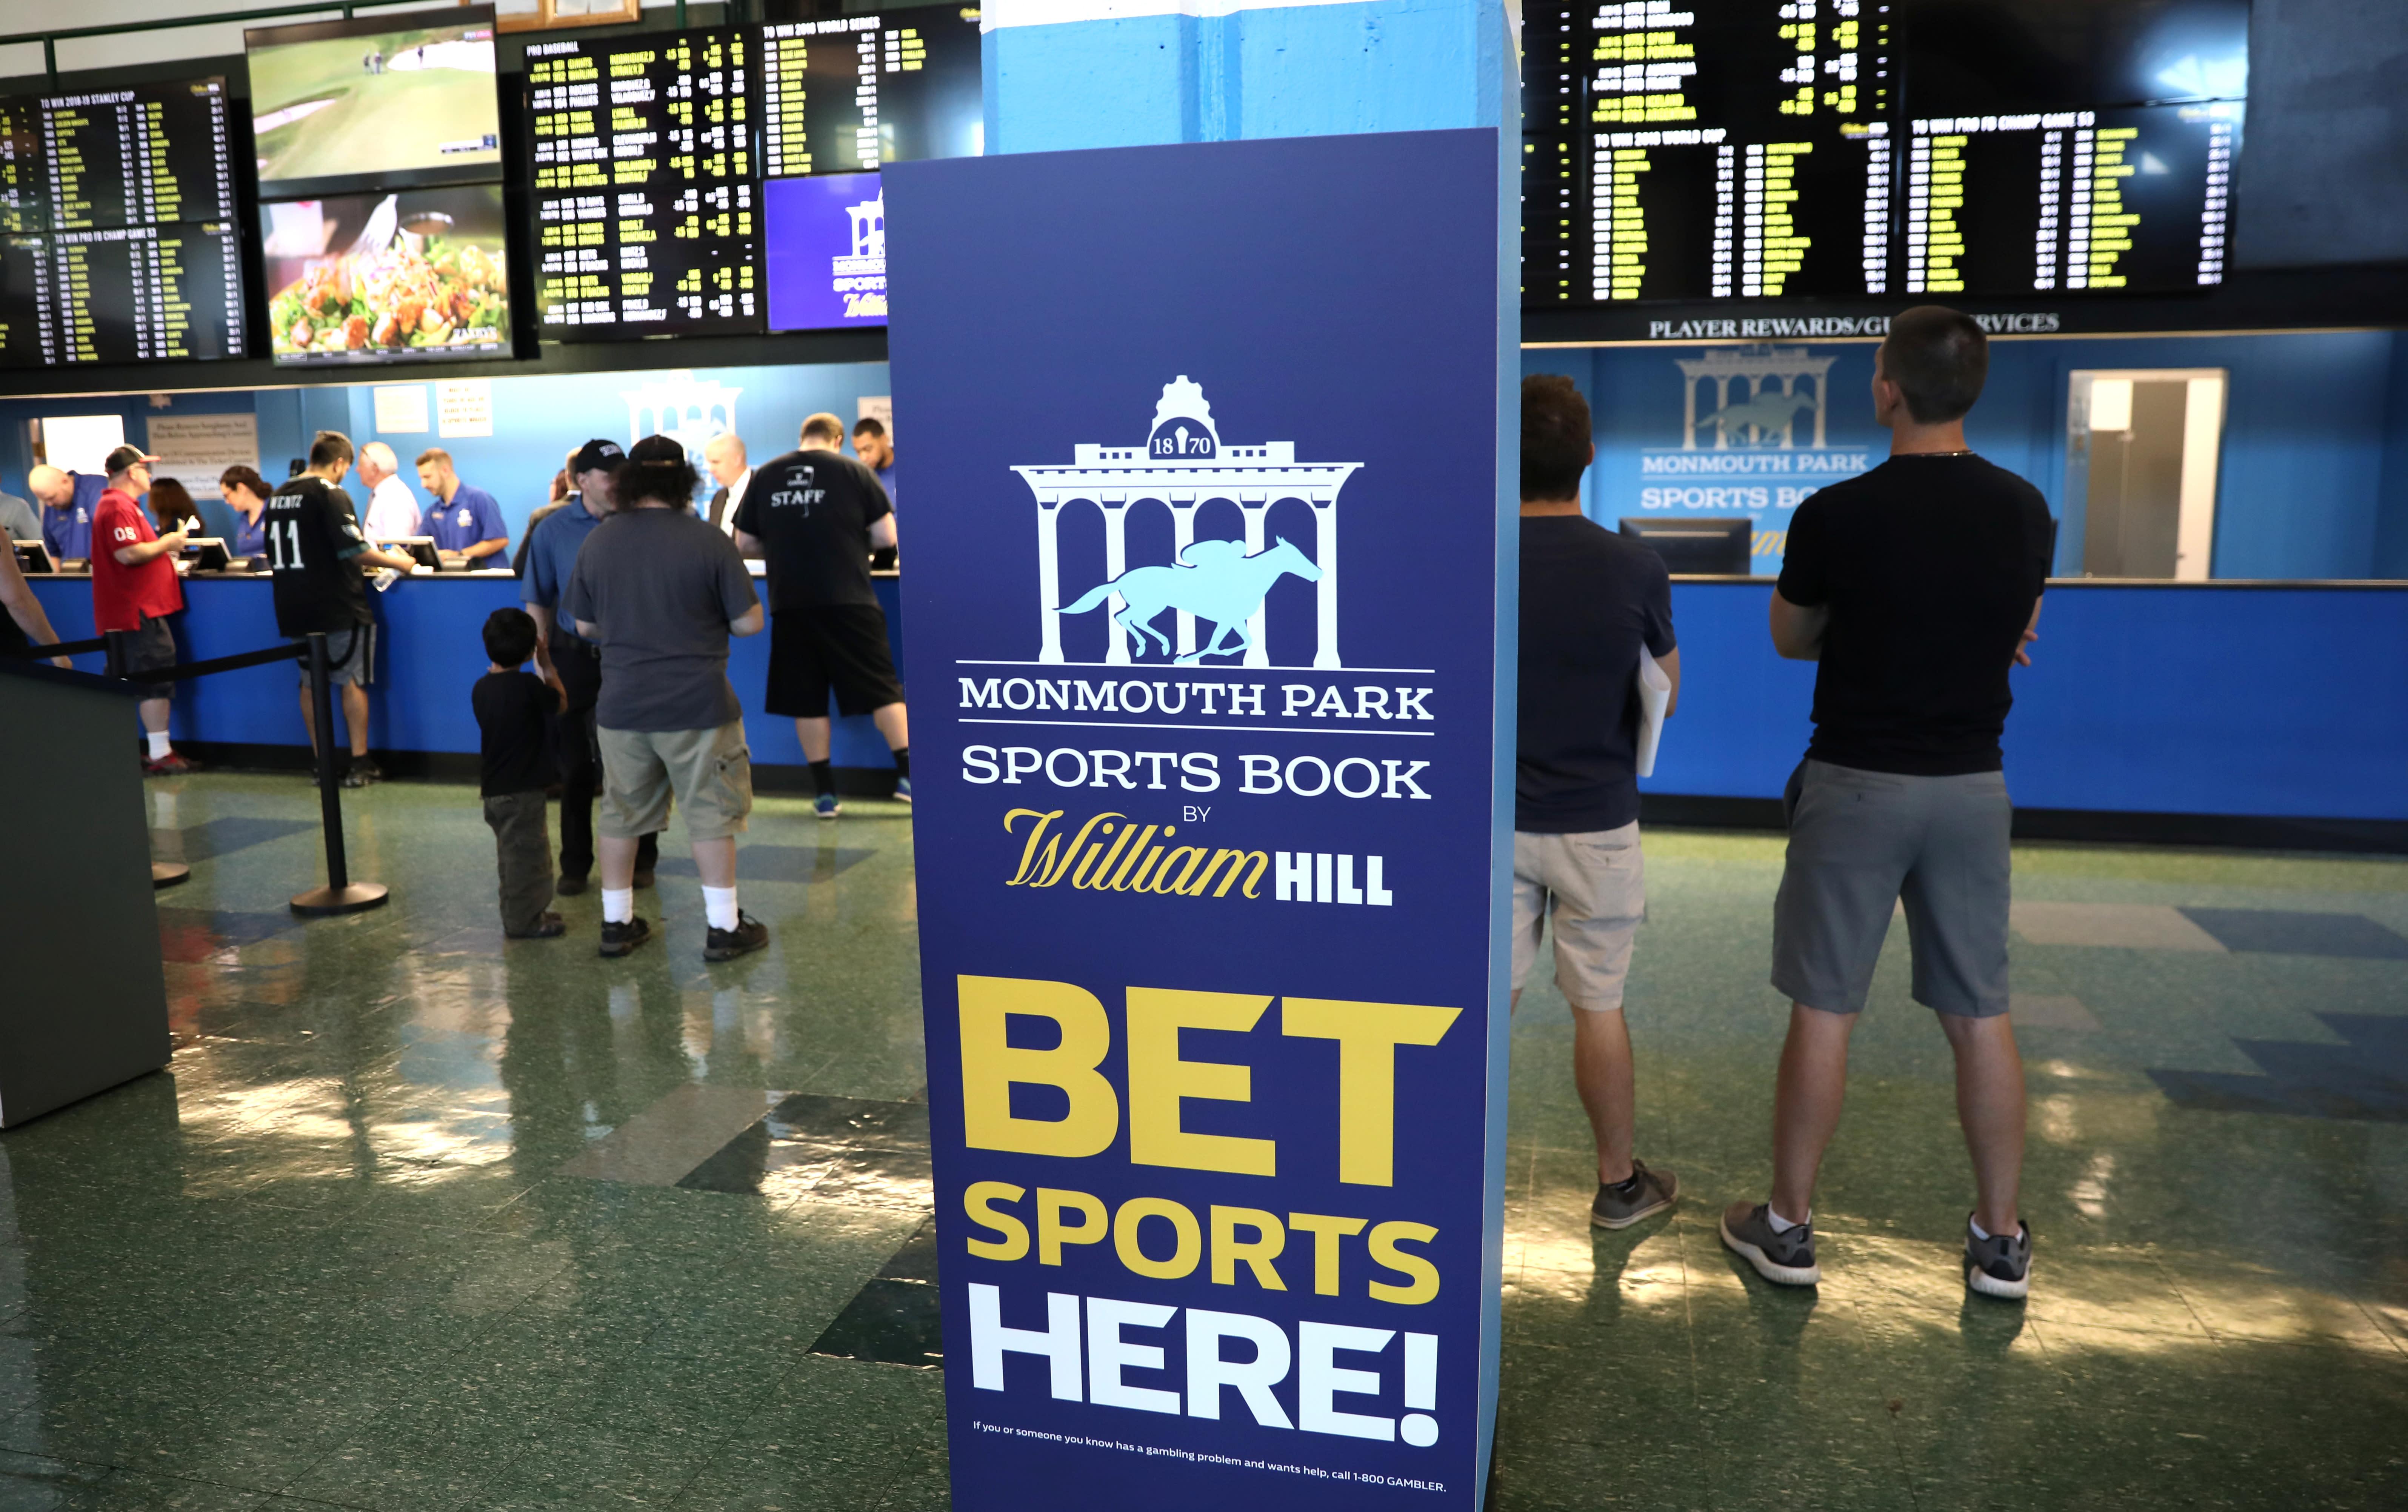 Big Sports Bets